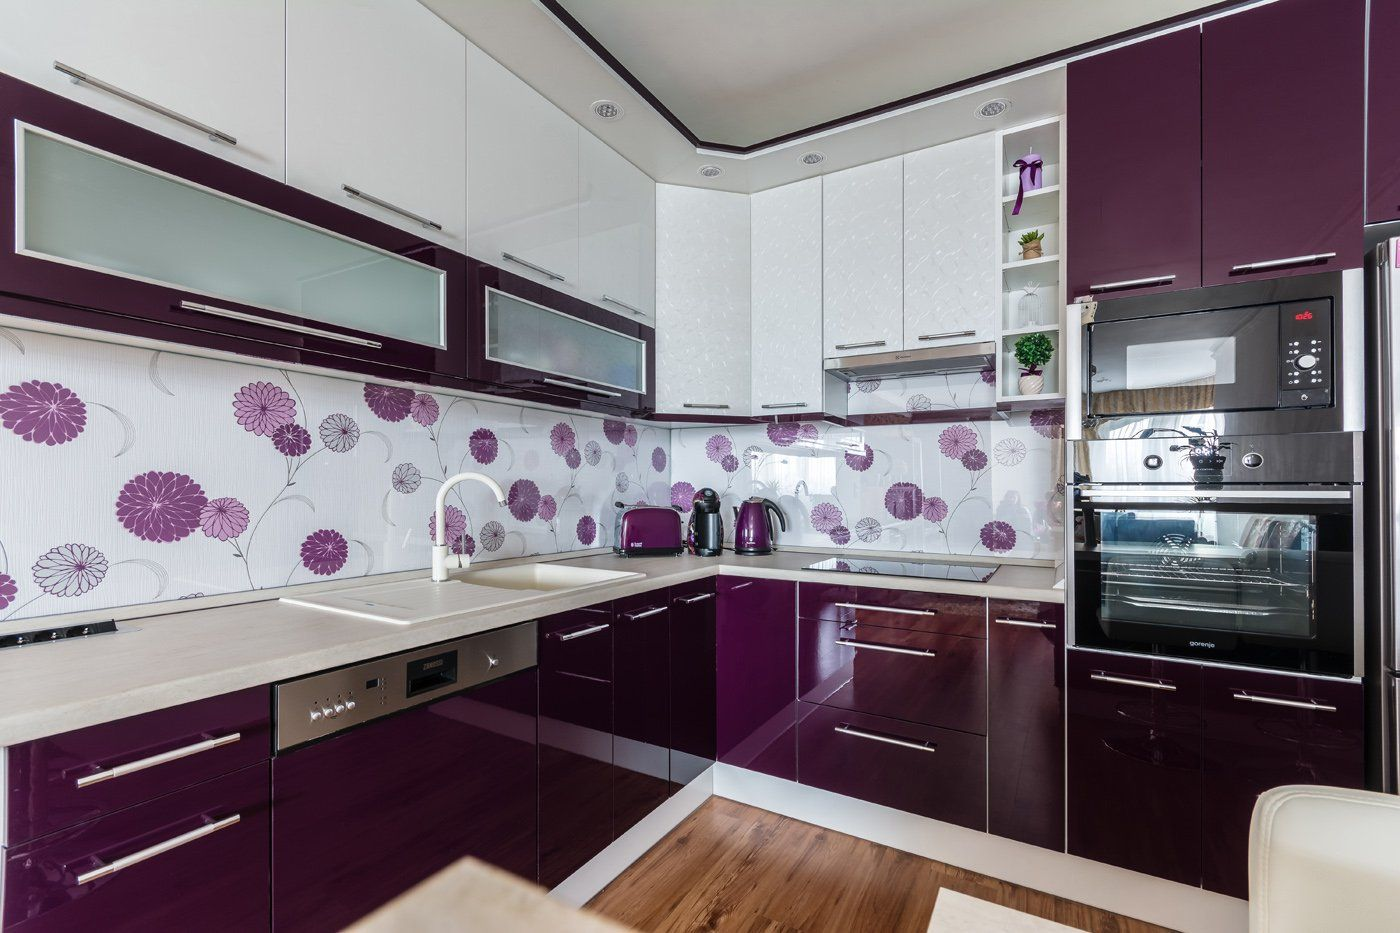 Lila Alomkonyha Tervezz Konyhat Magadnak Kitchen Room Design Kitchen Furniture Design Simple Kitchen Design